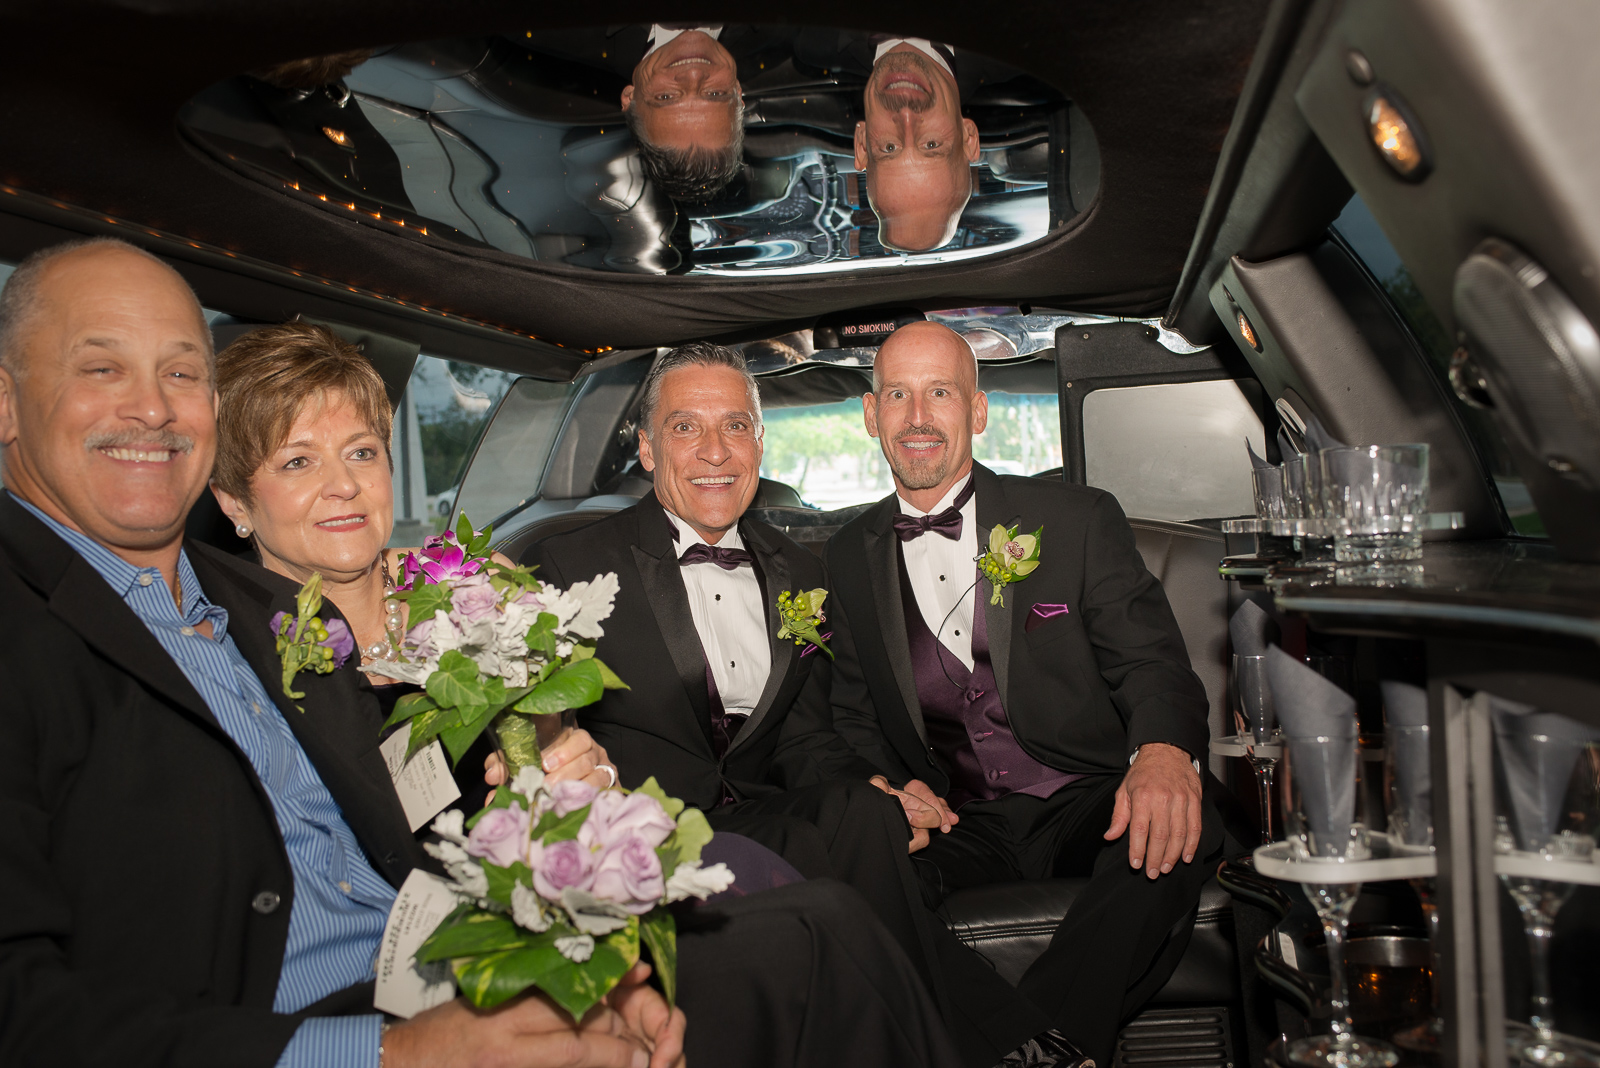 Michael-Napier-Weddings-Ludwig-Guilbeau Wedding-20 (23).jpg